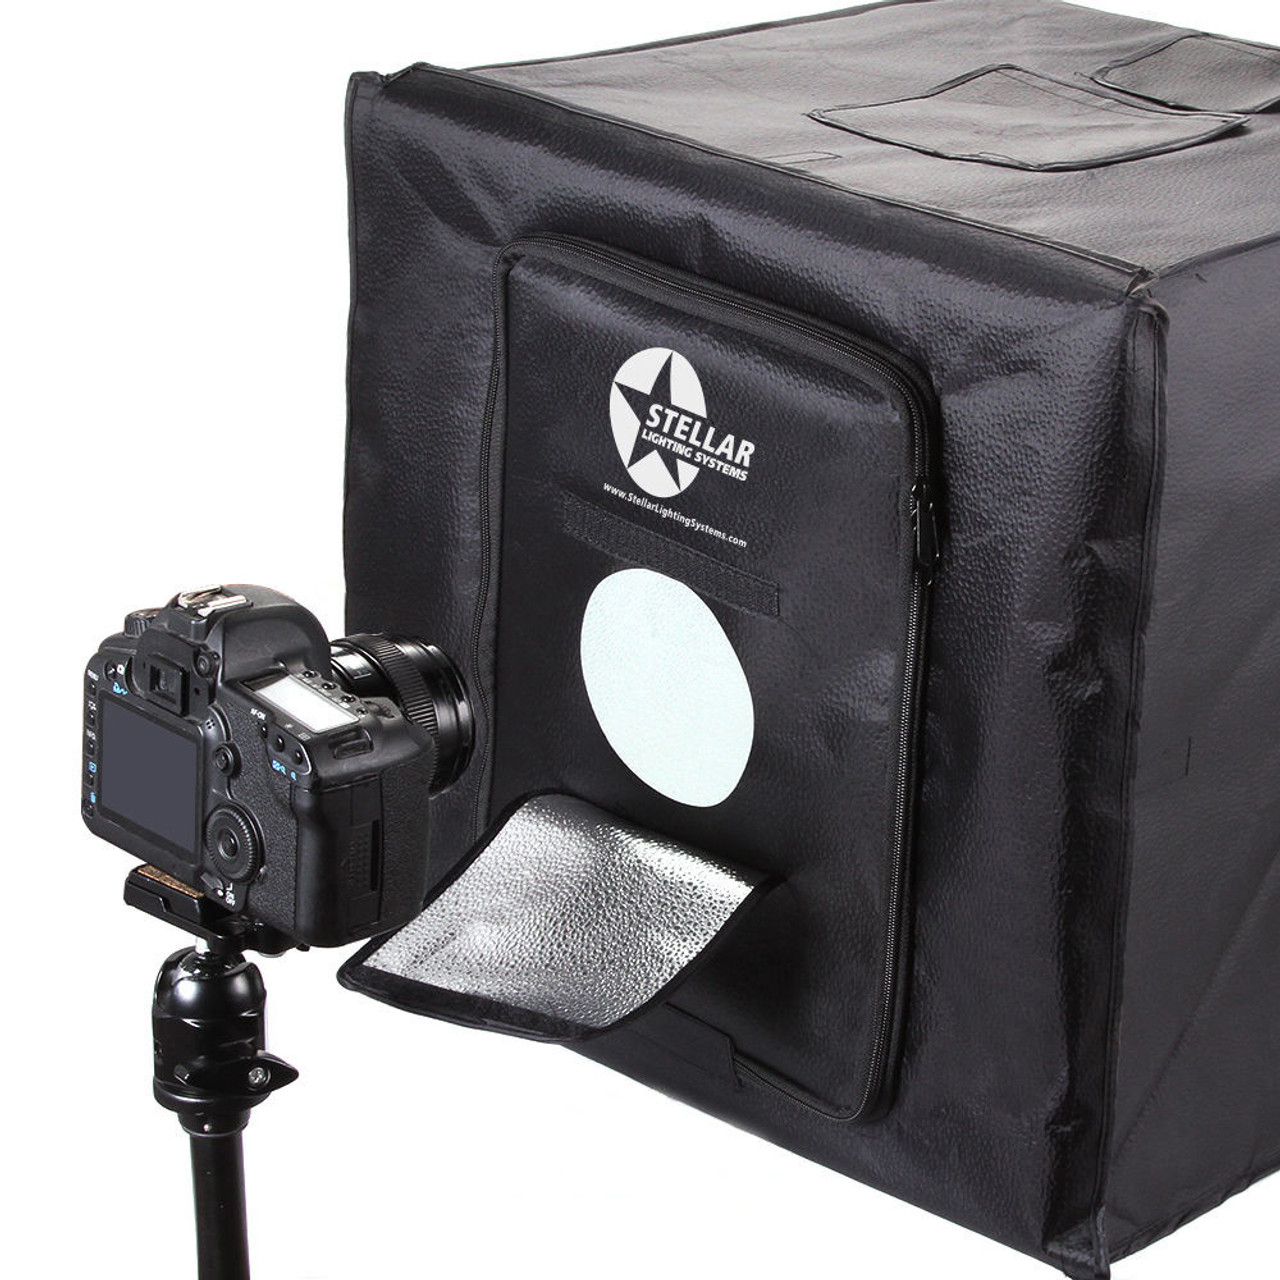 "Stellar Diva 18"" Ring Light + Stand+ Stellar Photo Cube"